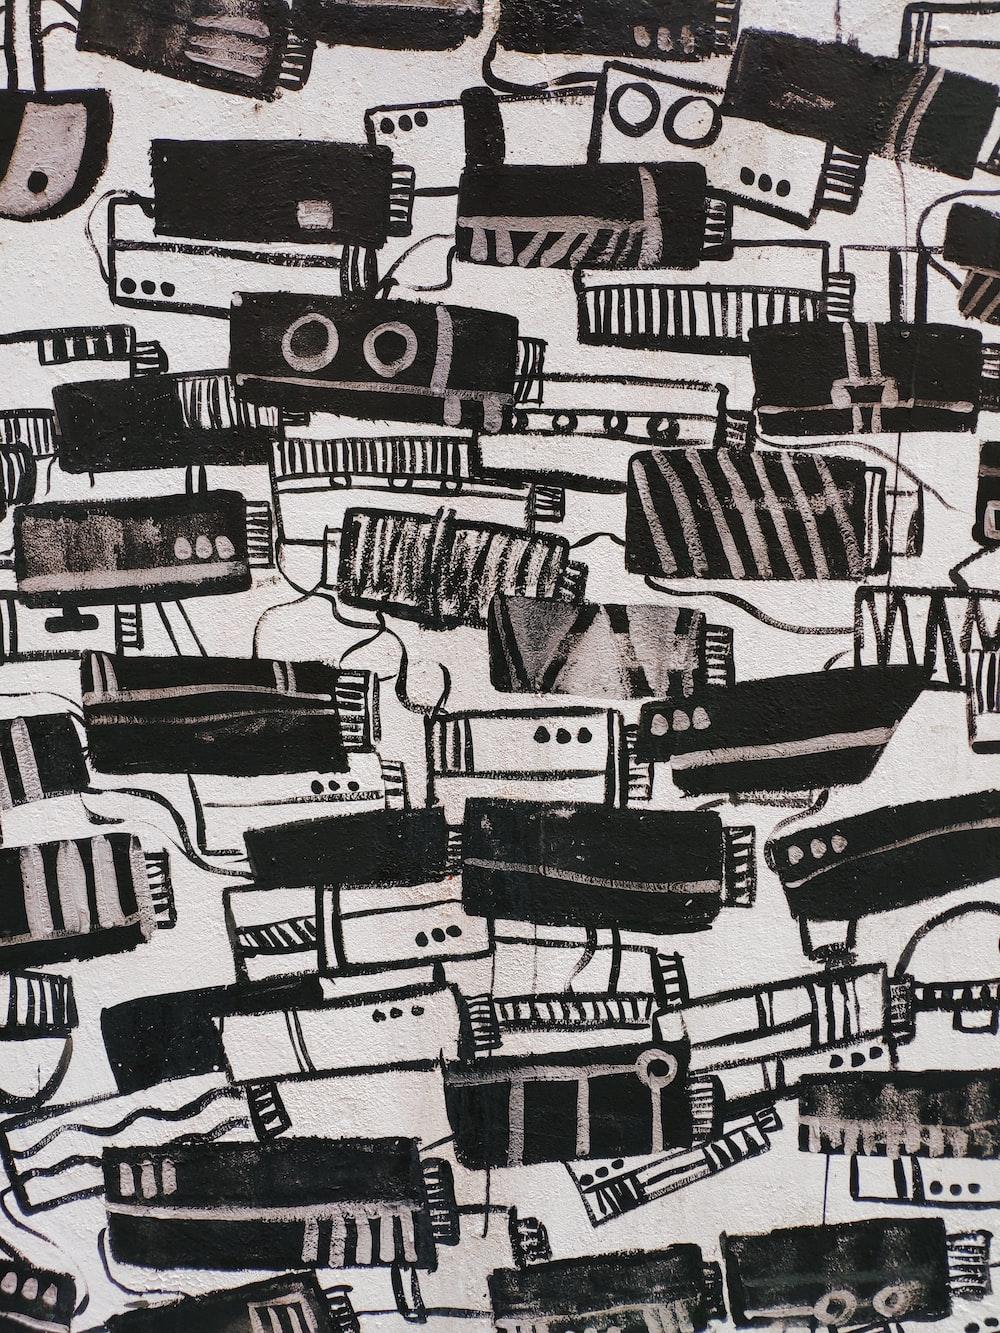 Graffiti School Desk Pictures | Download Free Images on Unsplash